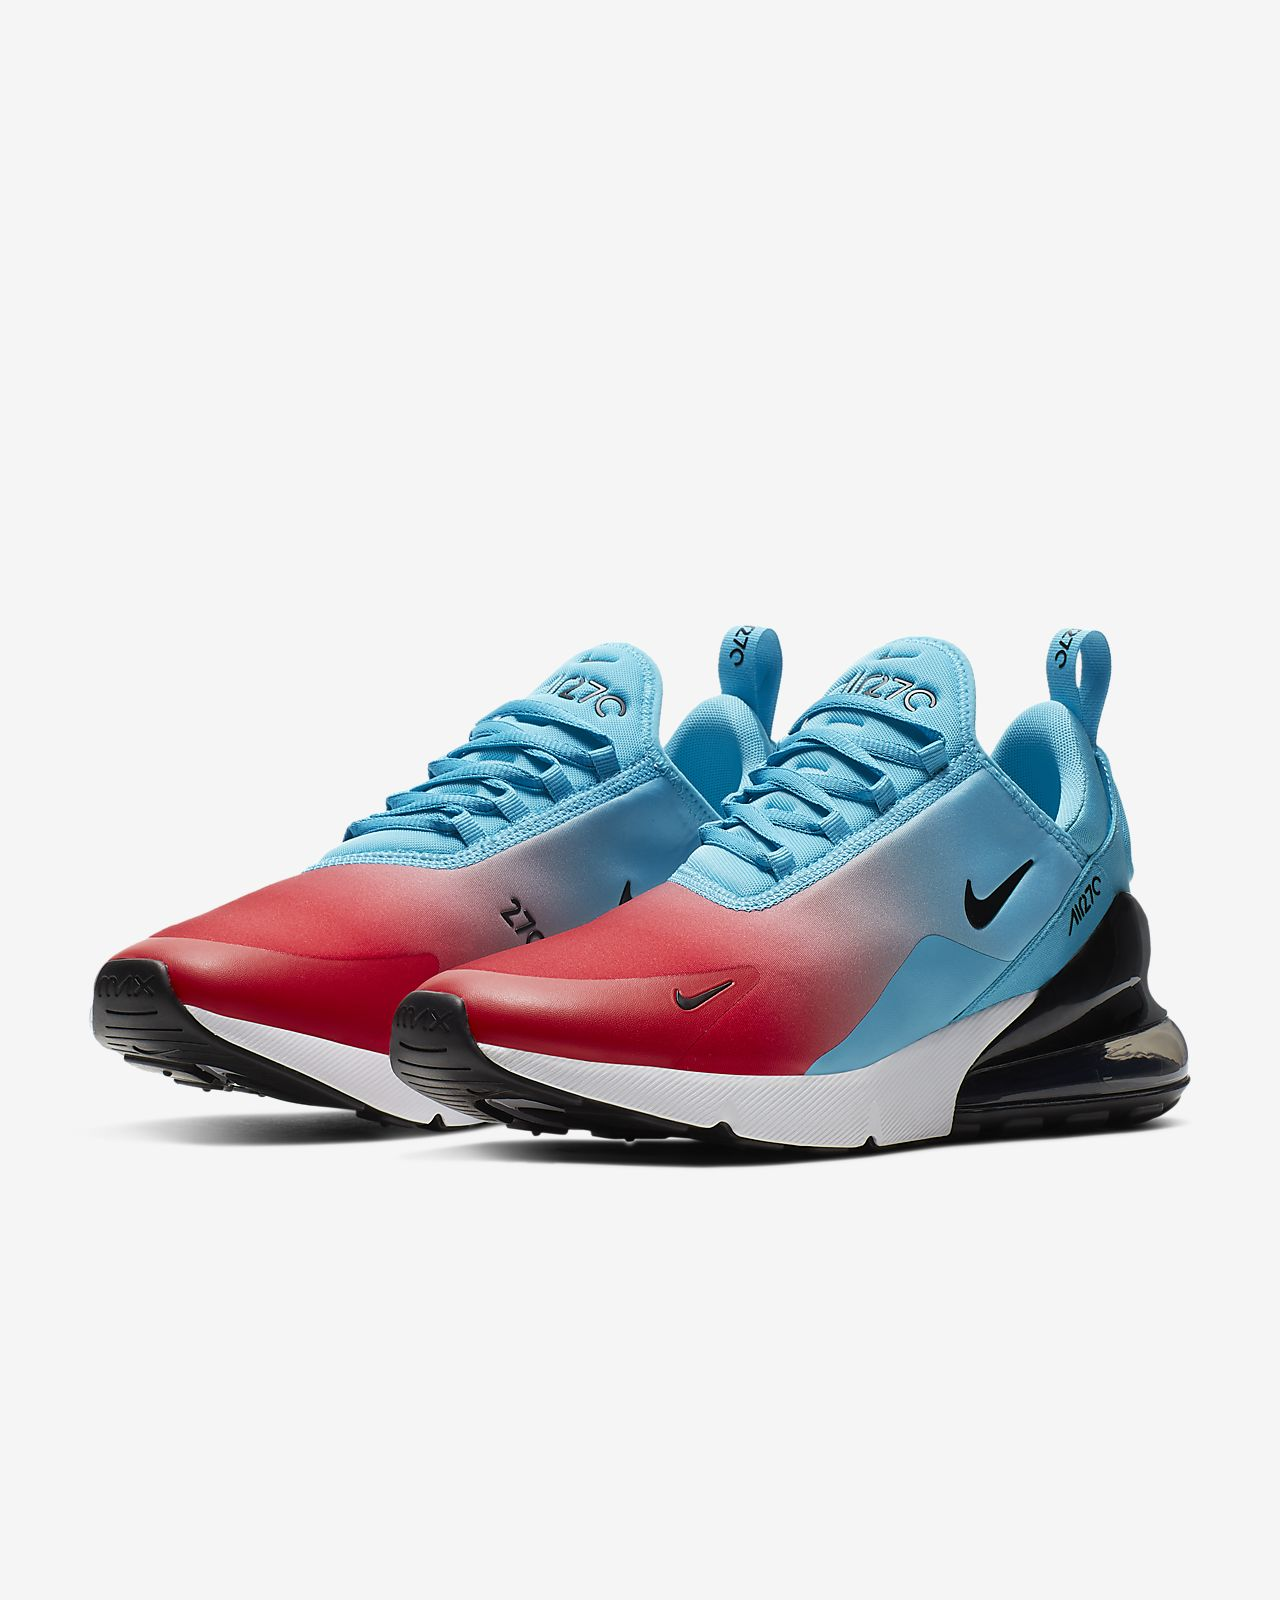 6b708dae79f0 Nike Air Max 270 Men s Shoe. Nike.com